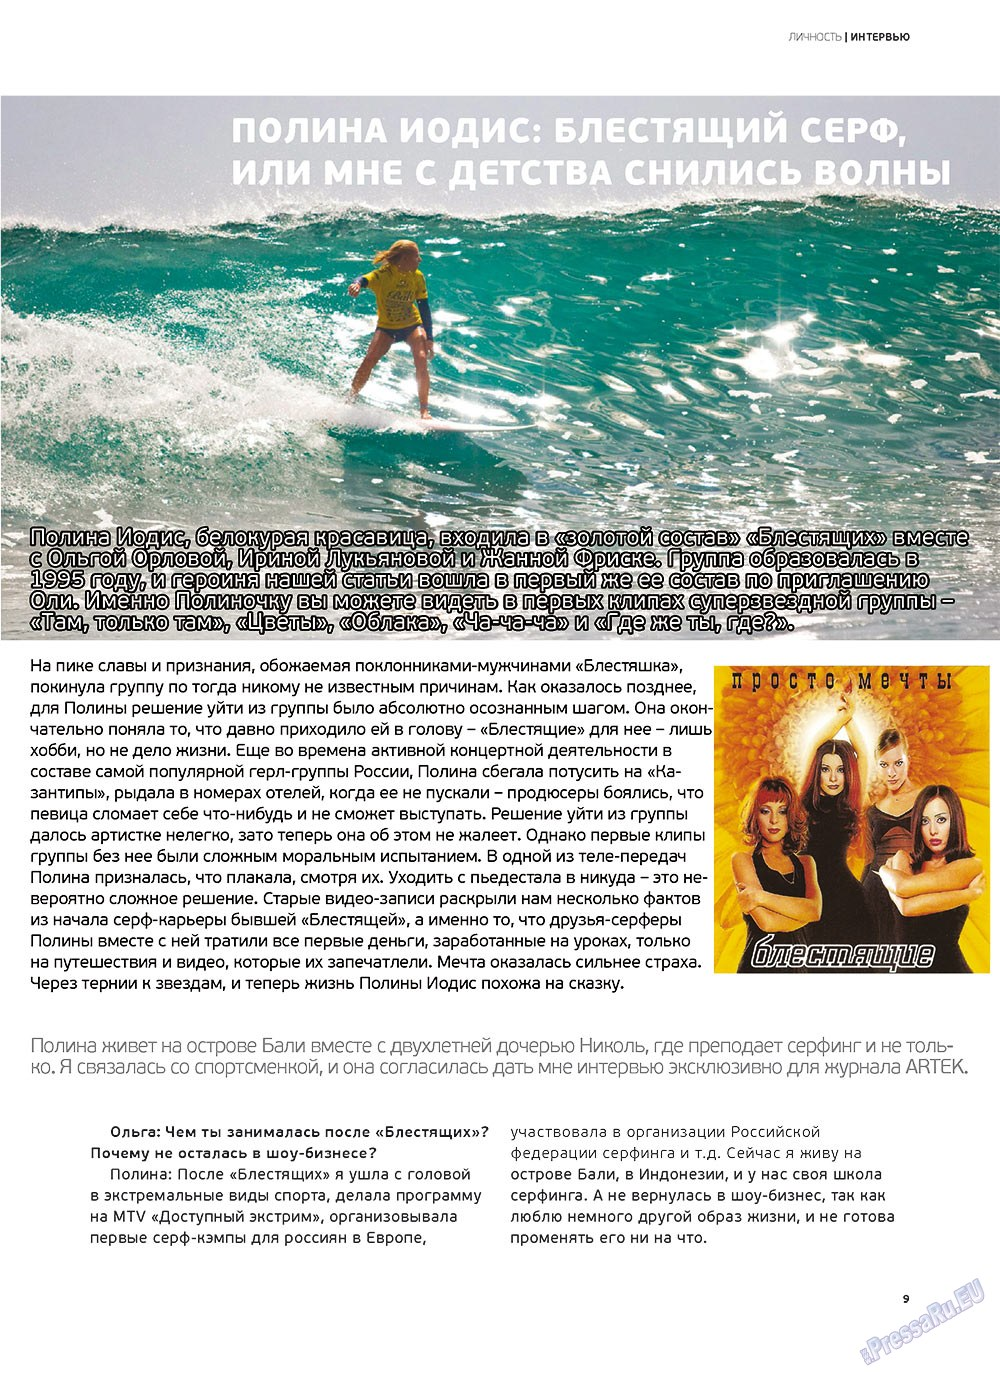 Артек (журнал). 2012 год, номер 2, стр. 11